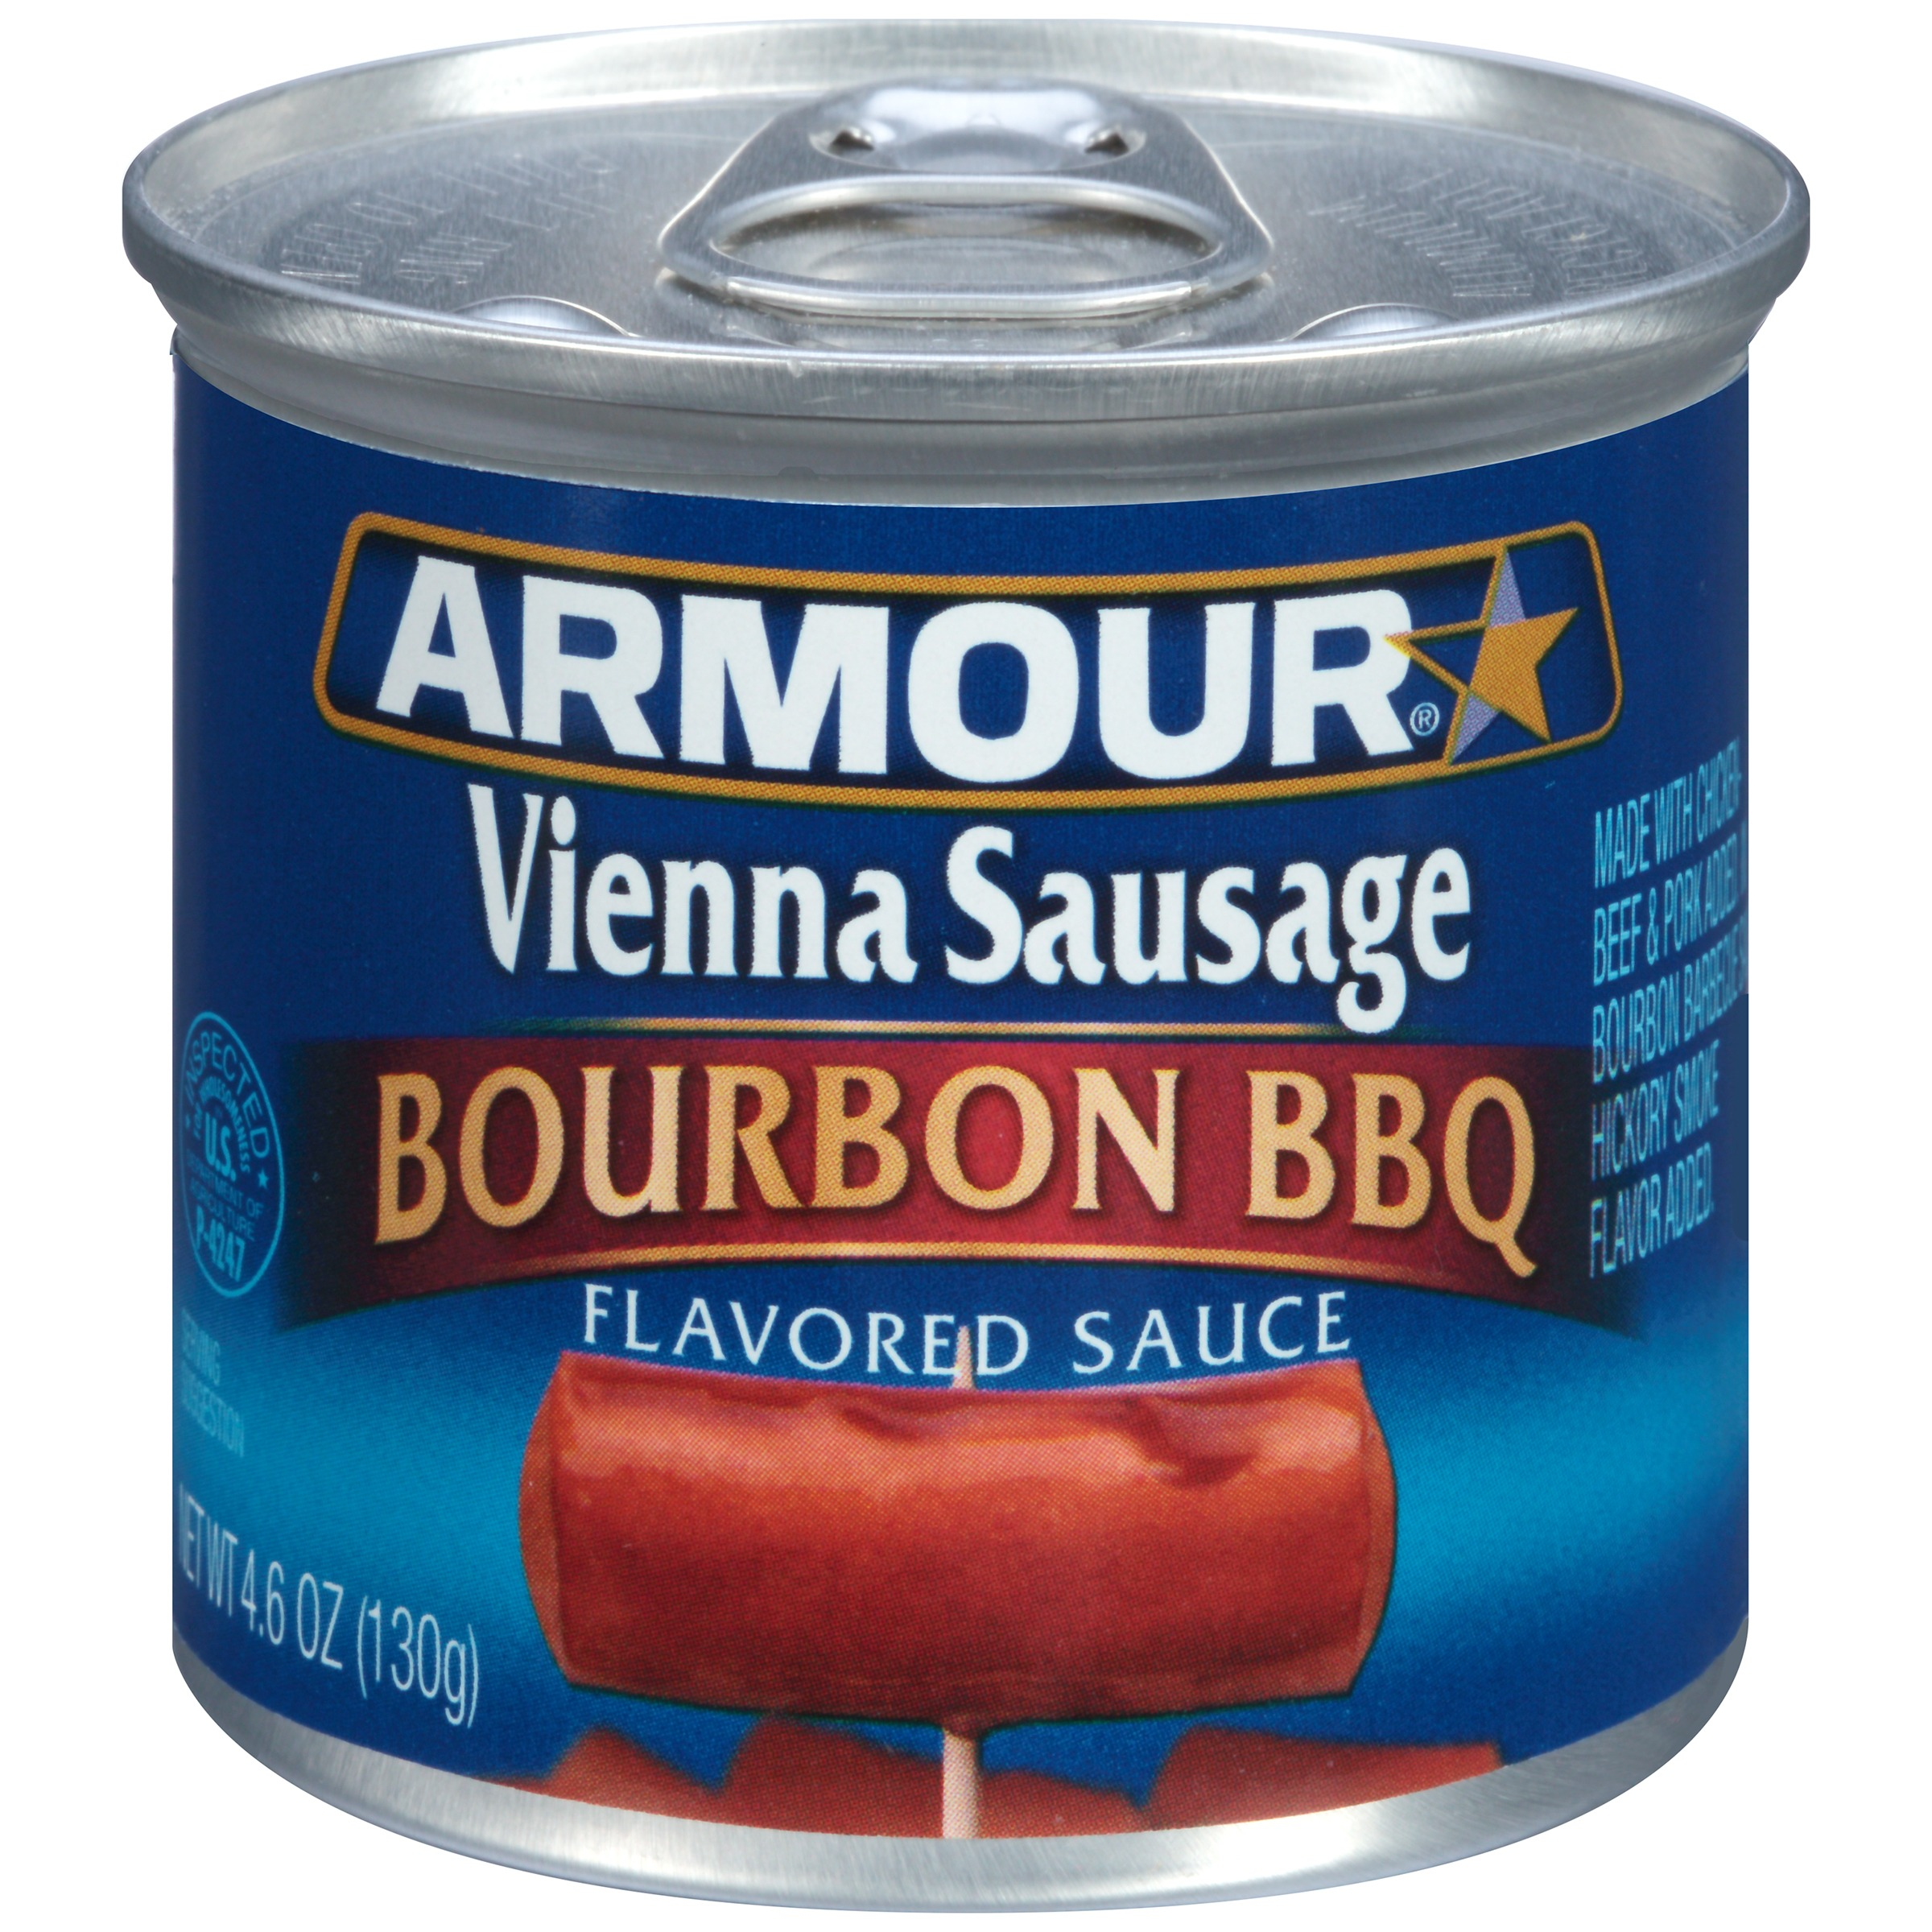 Armour Bourbon BBQ Flavored Vienna Sausage, 4.6 oz